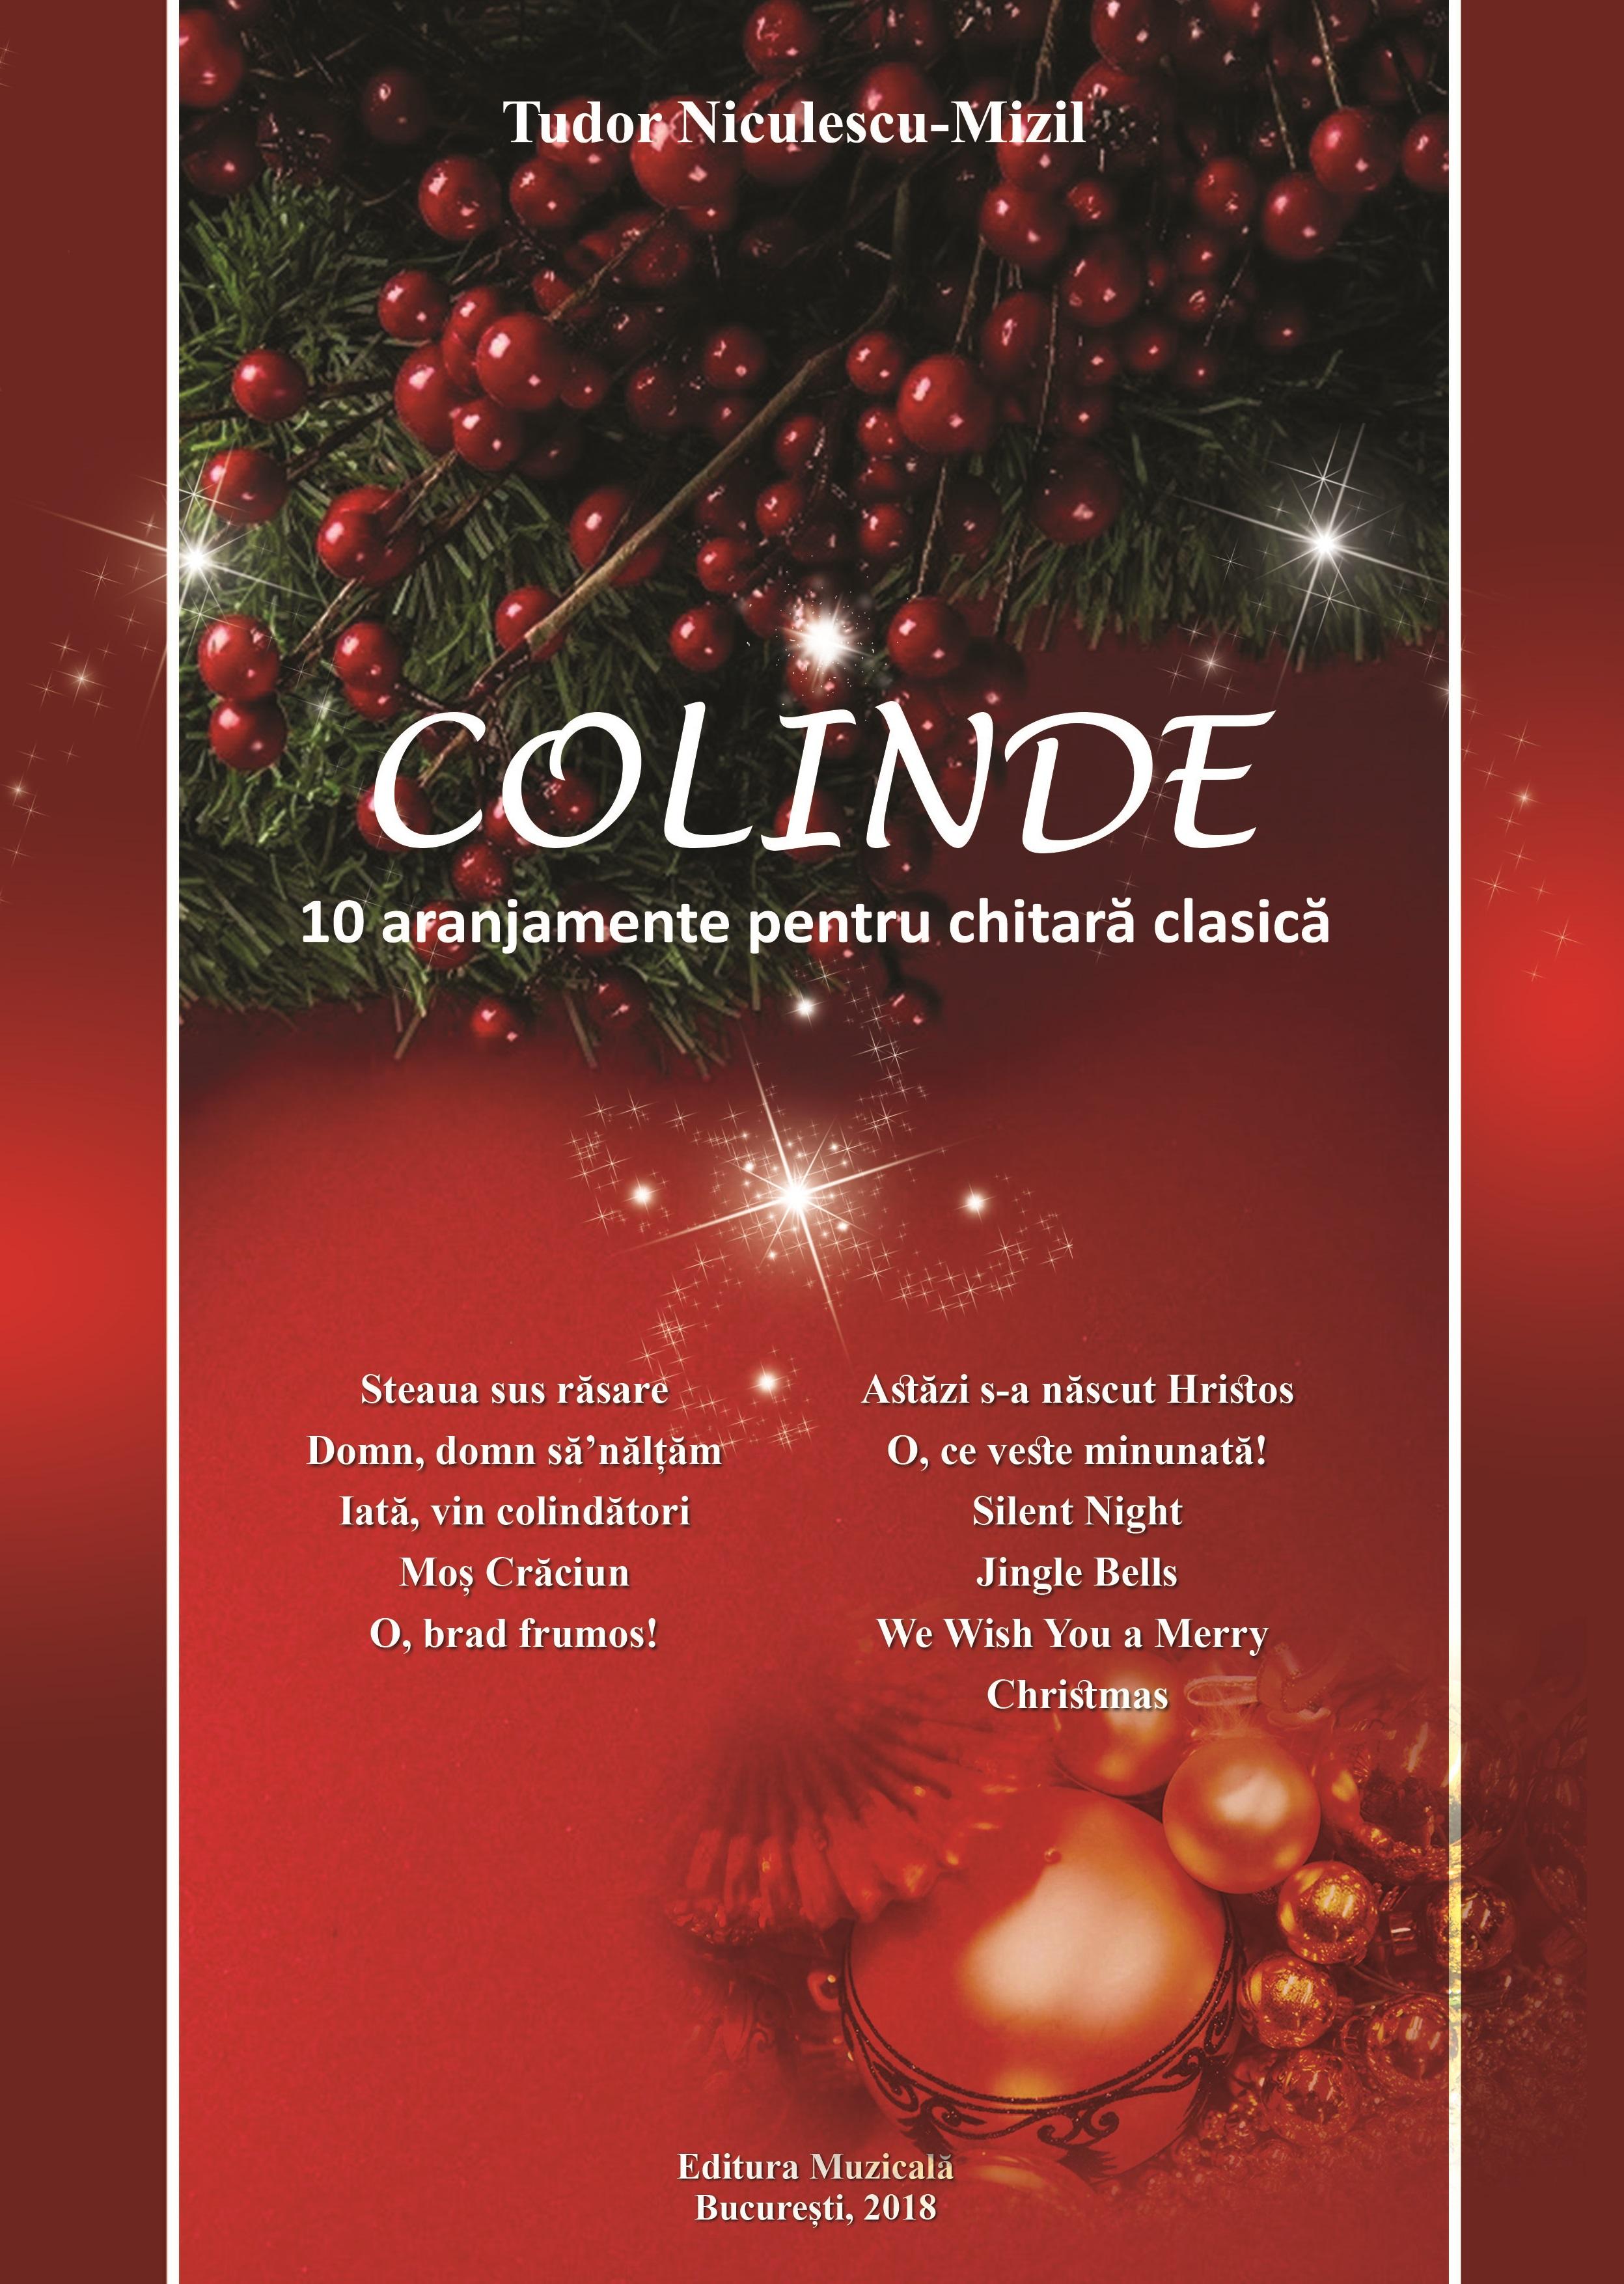 Tudor-Niculescu-Mizil Christmas Carols Guitar